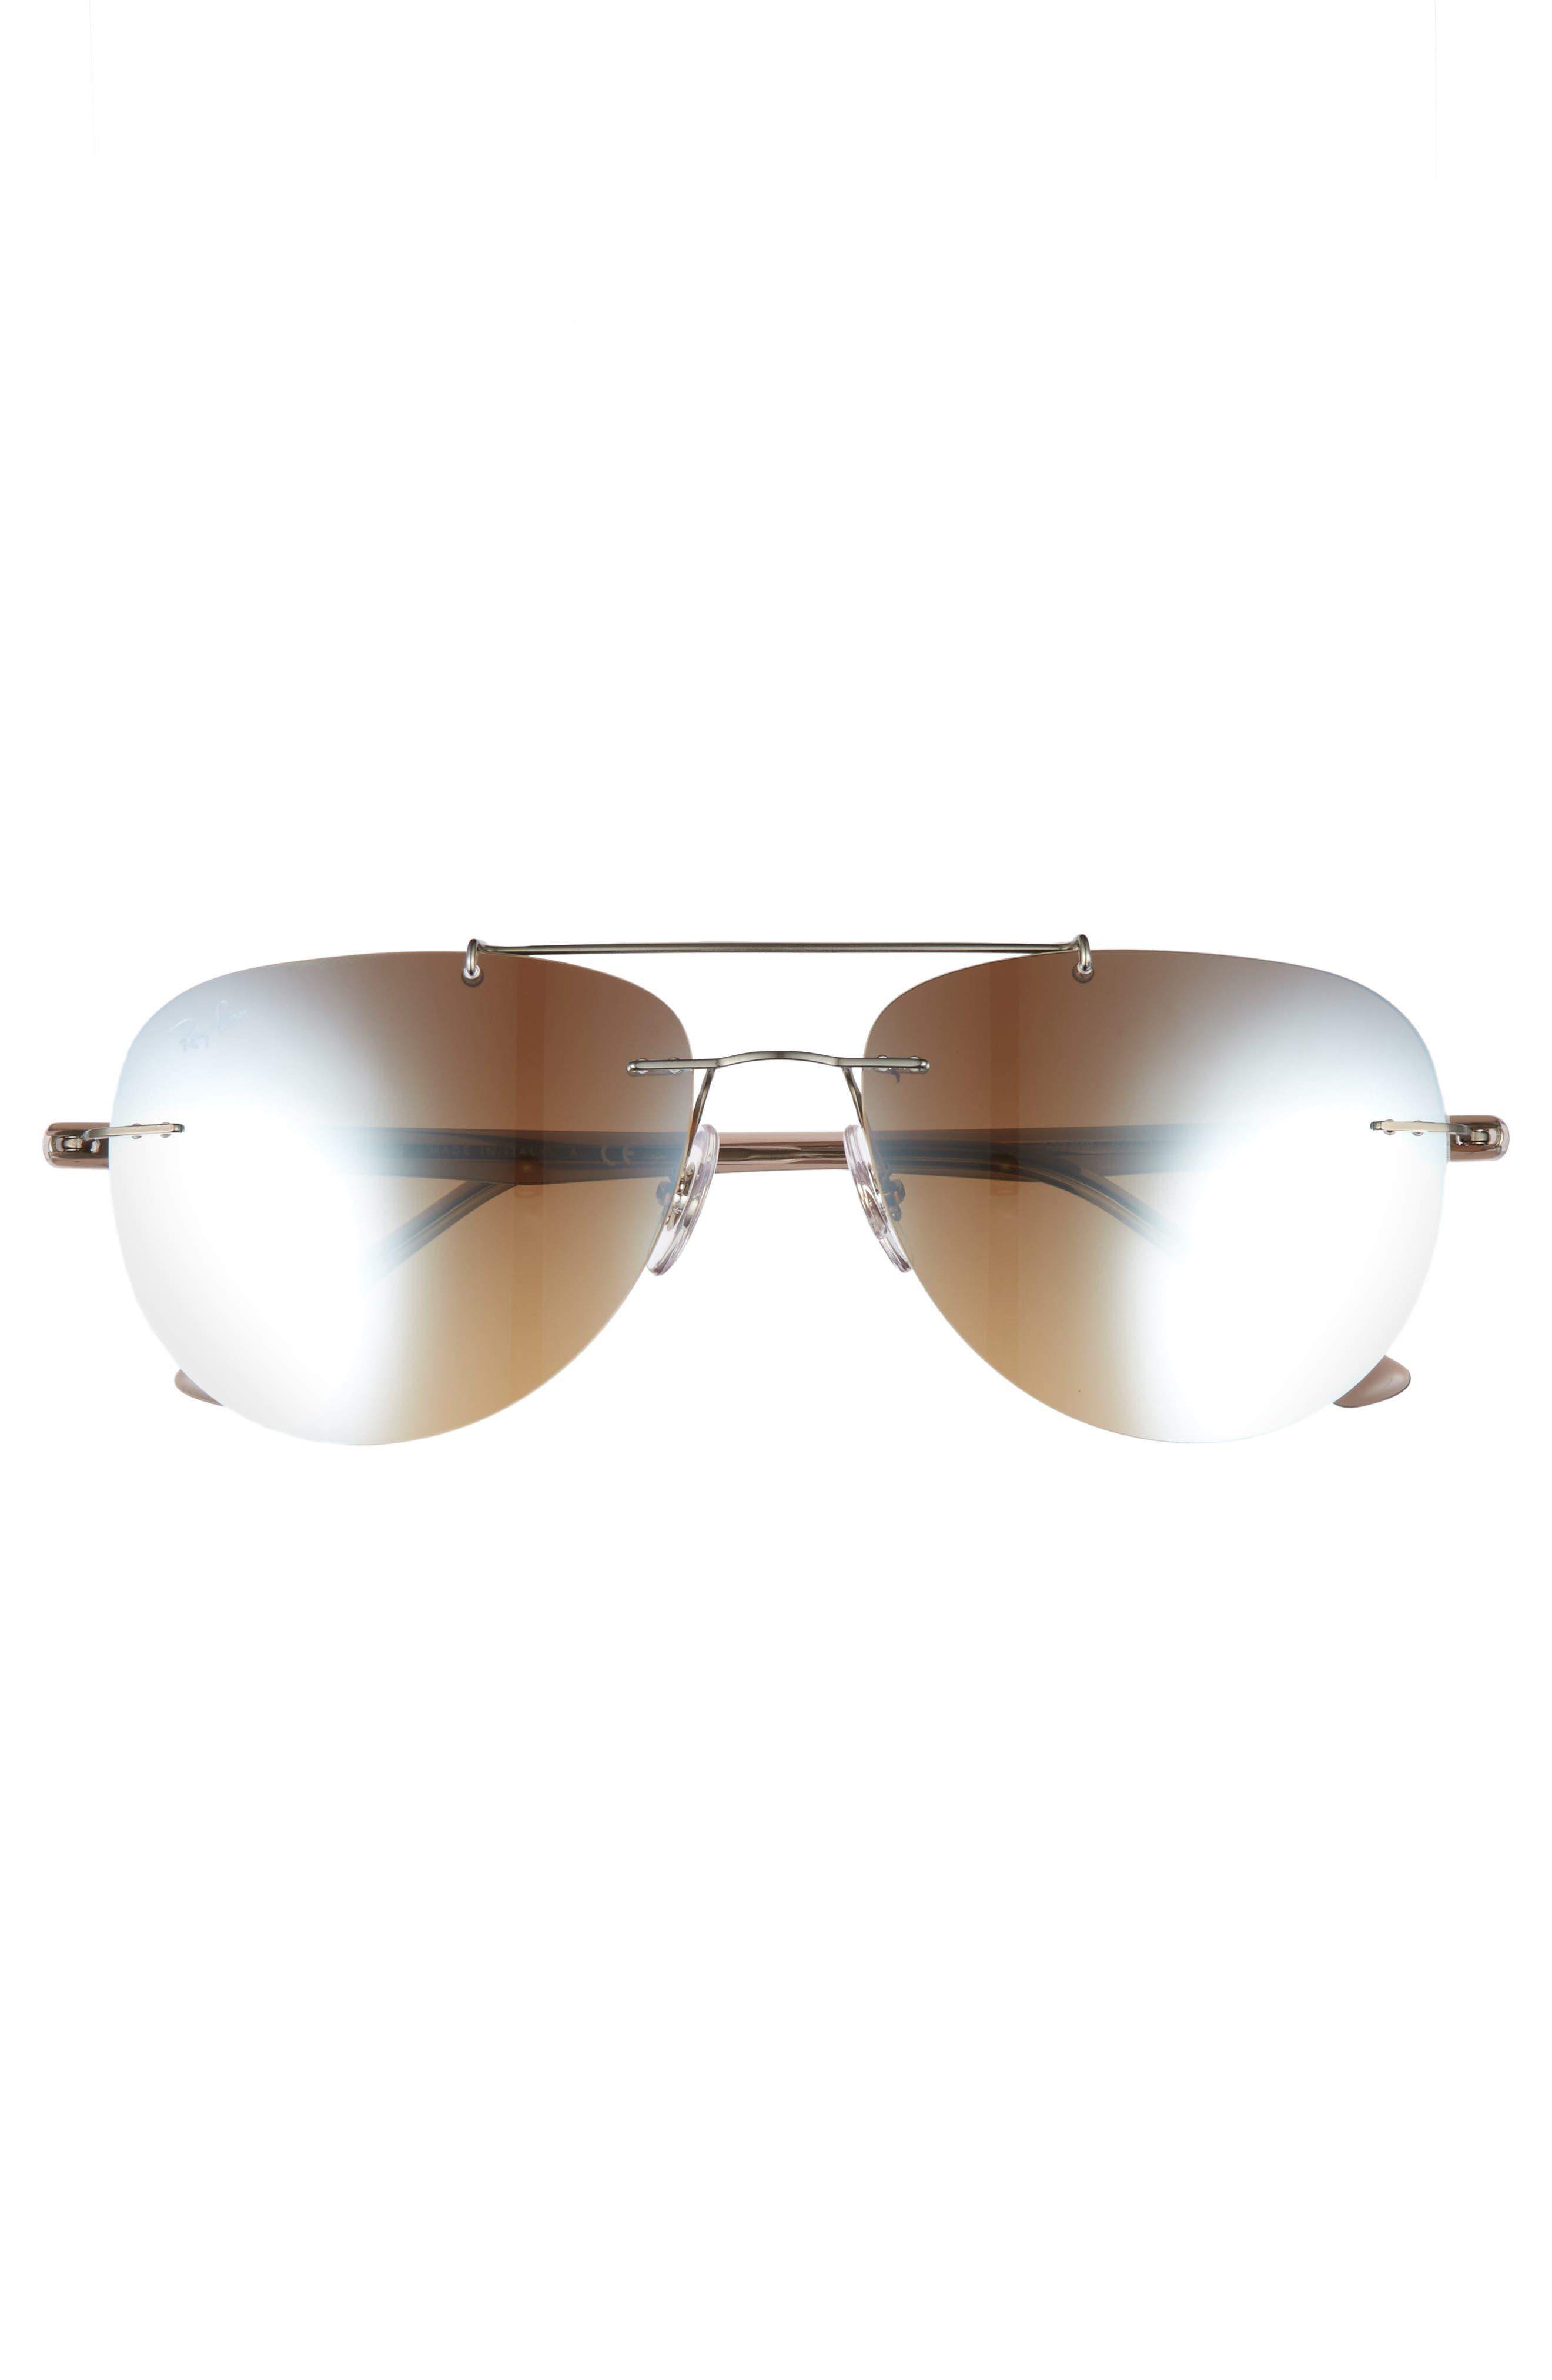 Phantos 57mm Mirrored Rimless Aviator Sunglasses,                             Alternate thumbnail 2, color,                             Silver